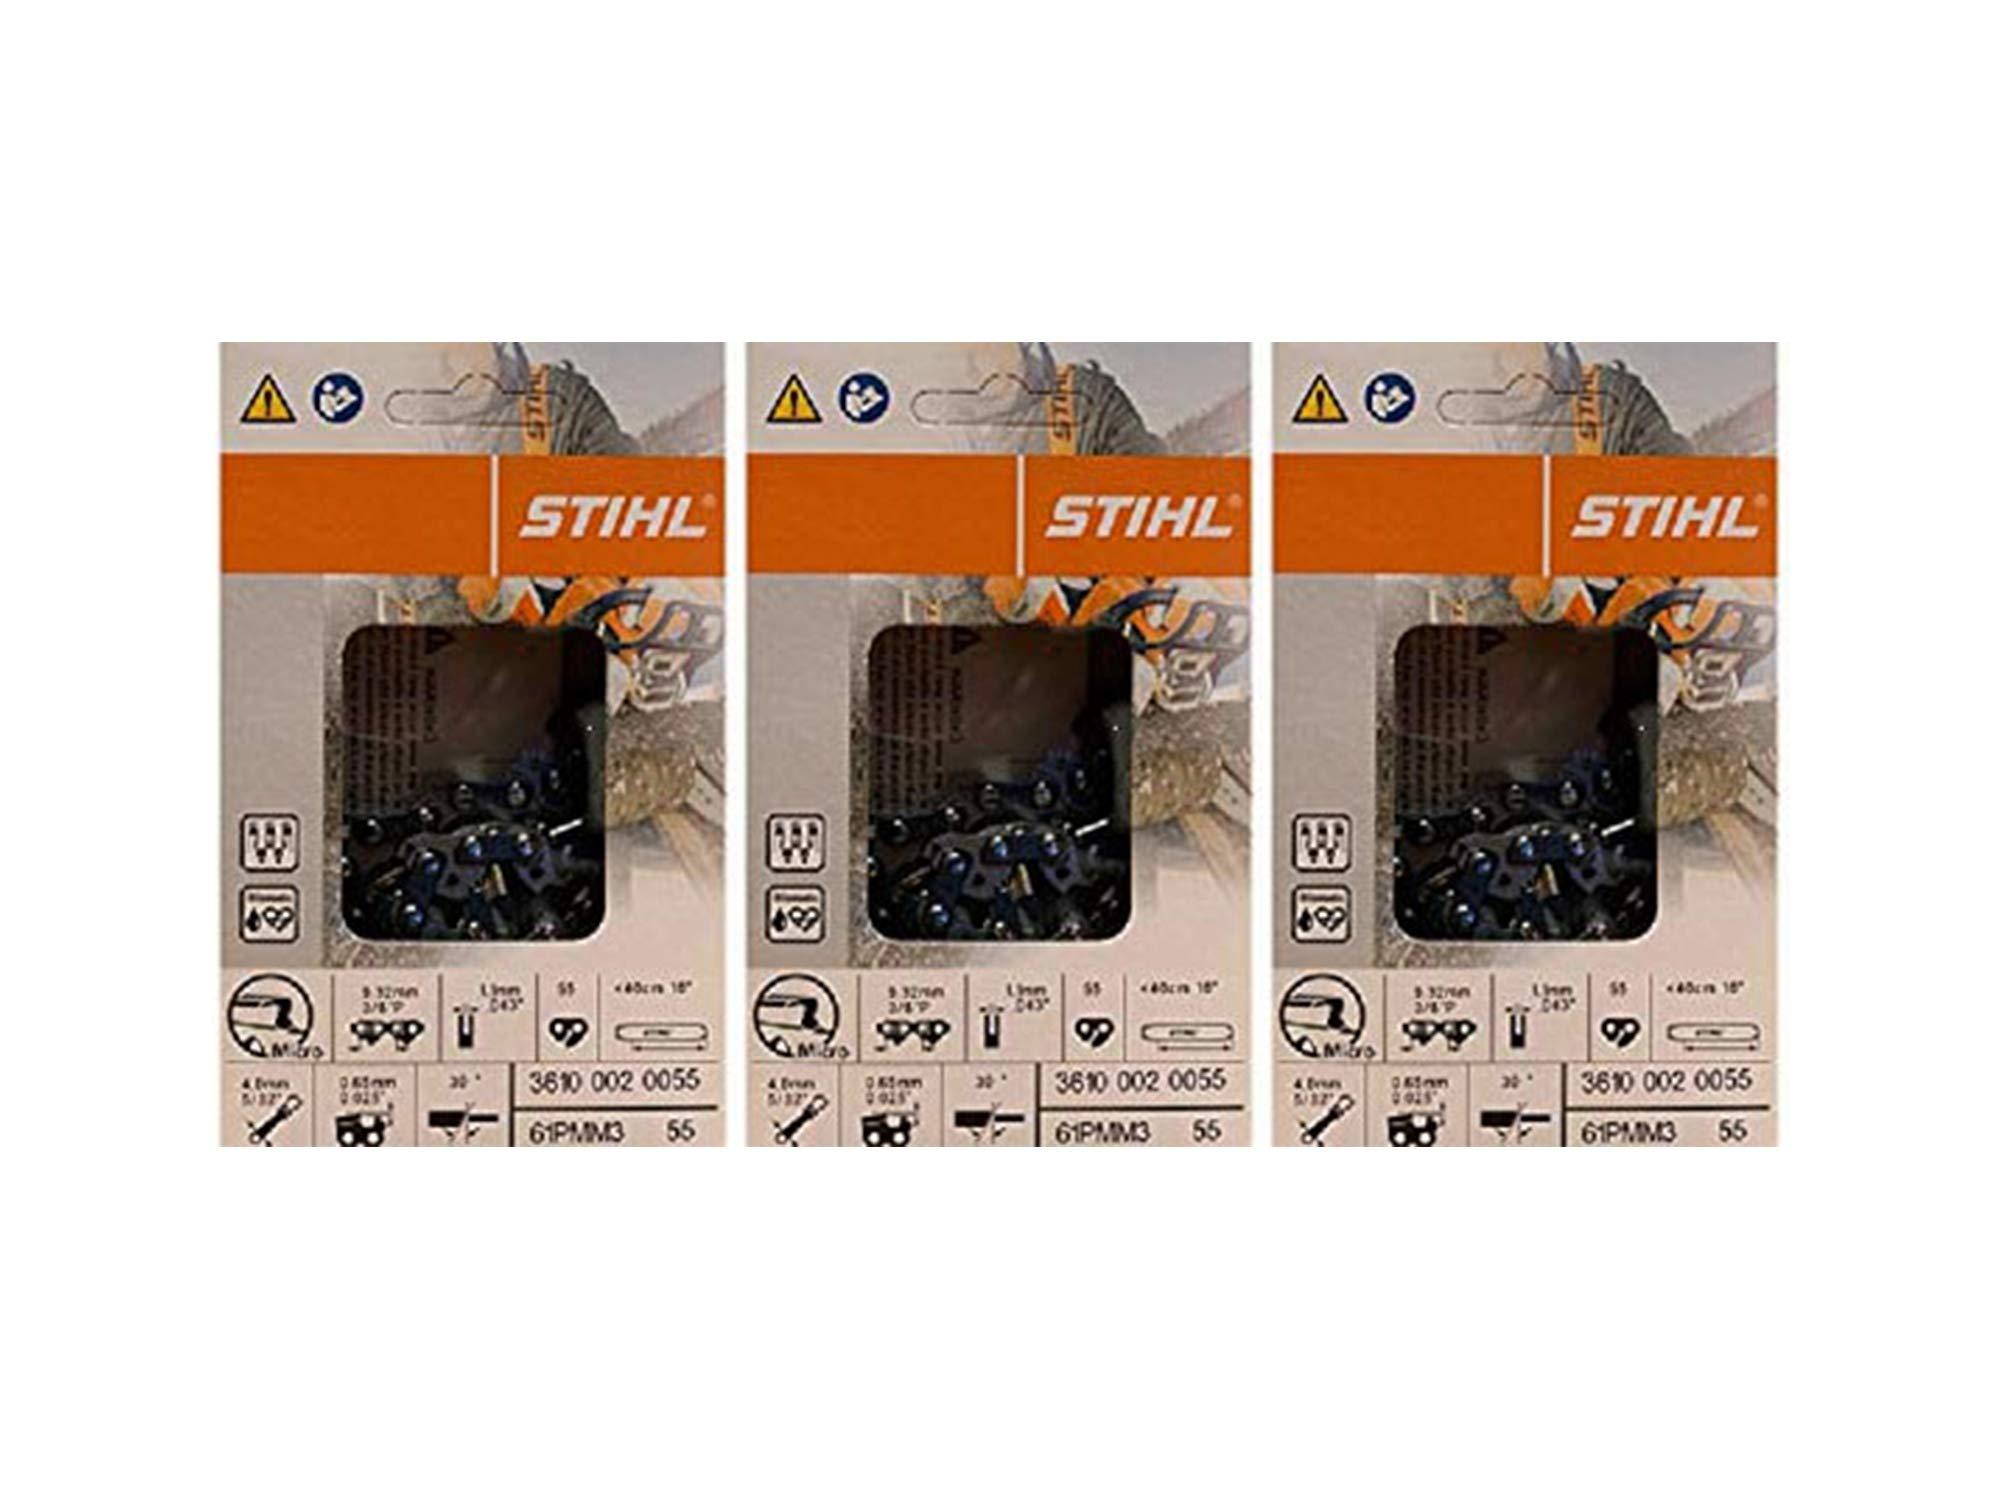 3 pk) 16'' Stihl Chainsaw Picco Micro Oilomatic Saw Chain 61PMM355 3/8p .043 55dl